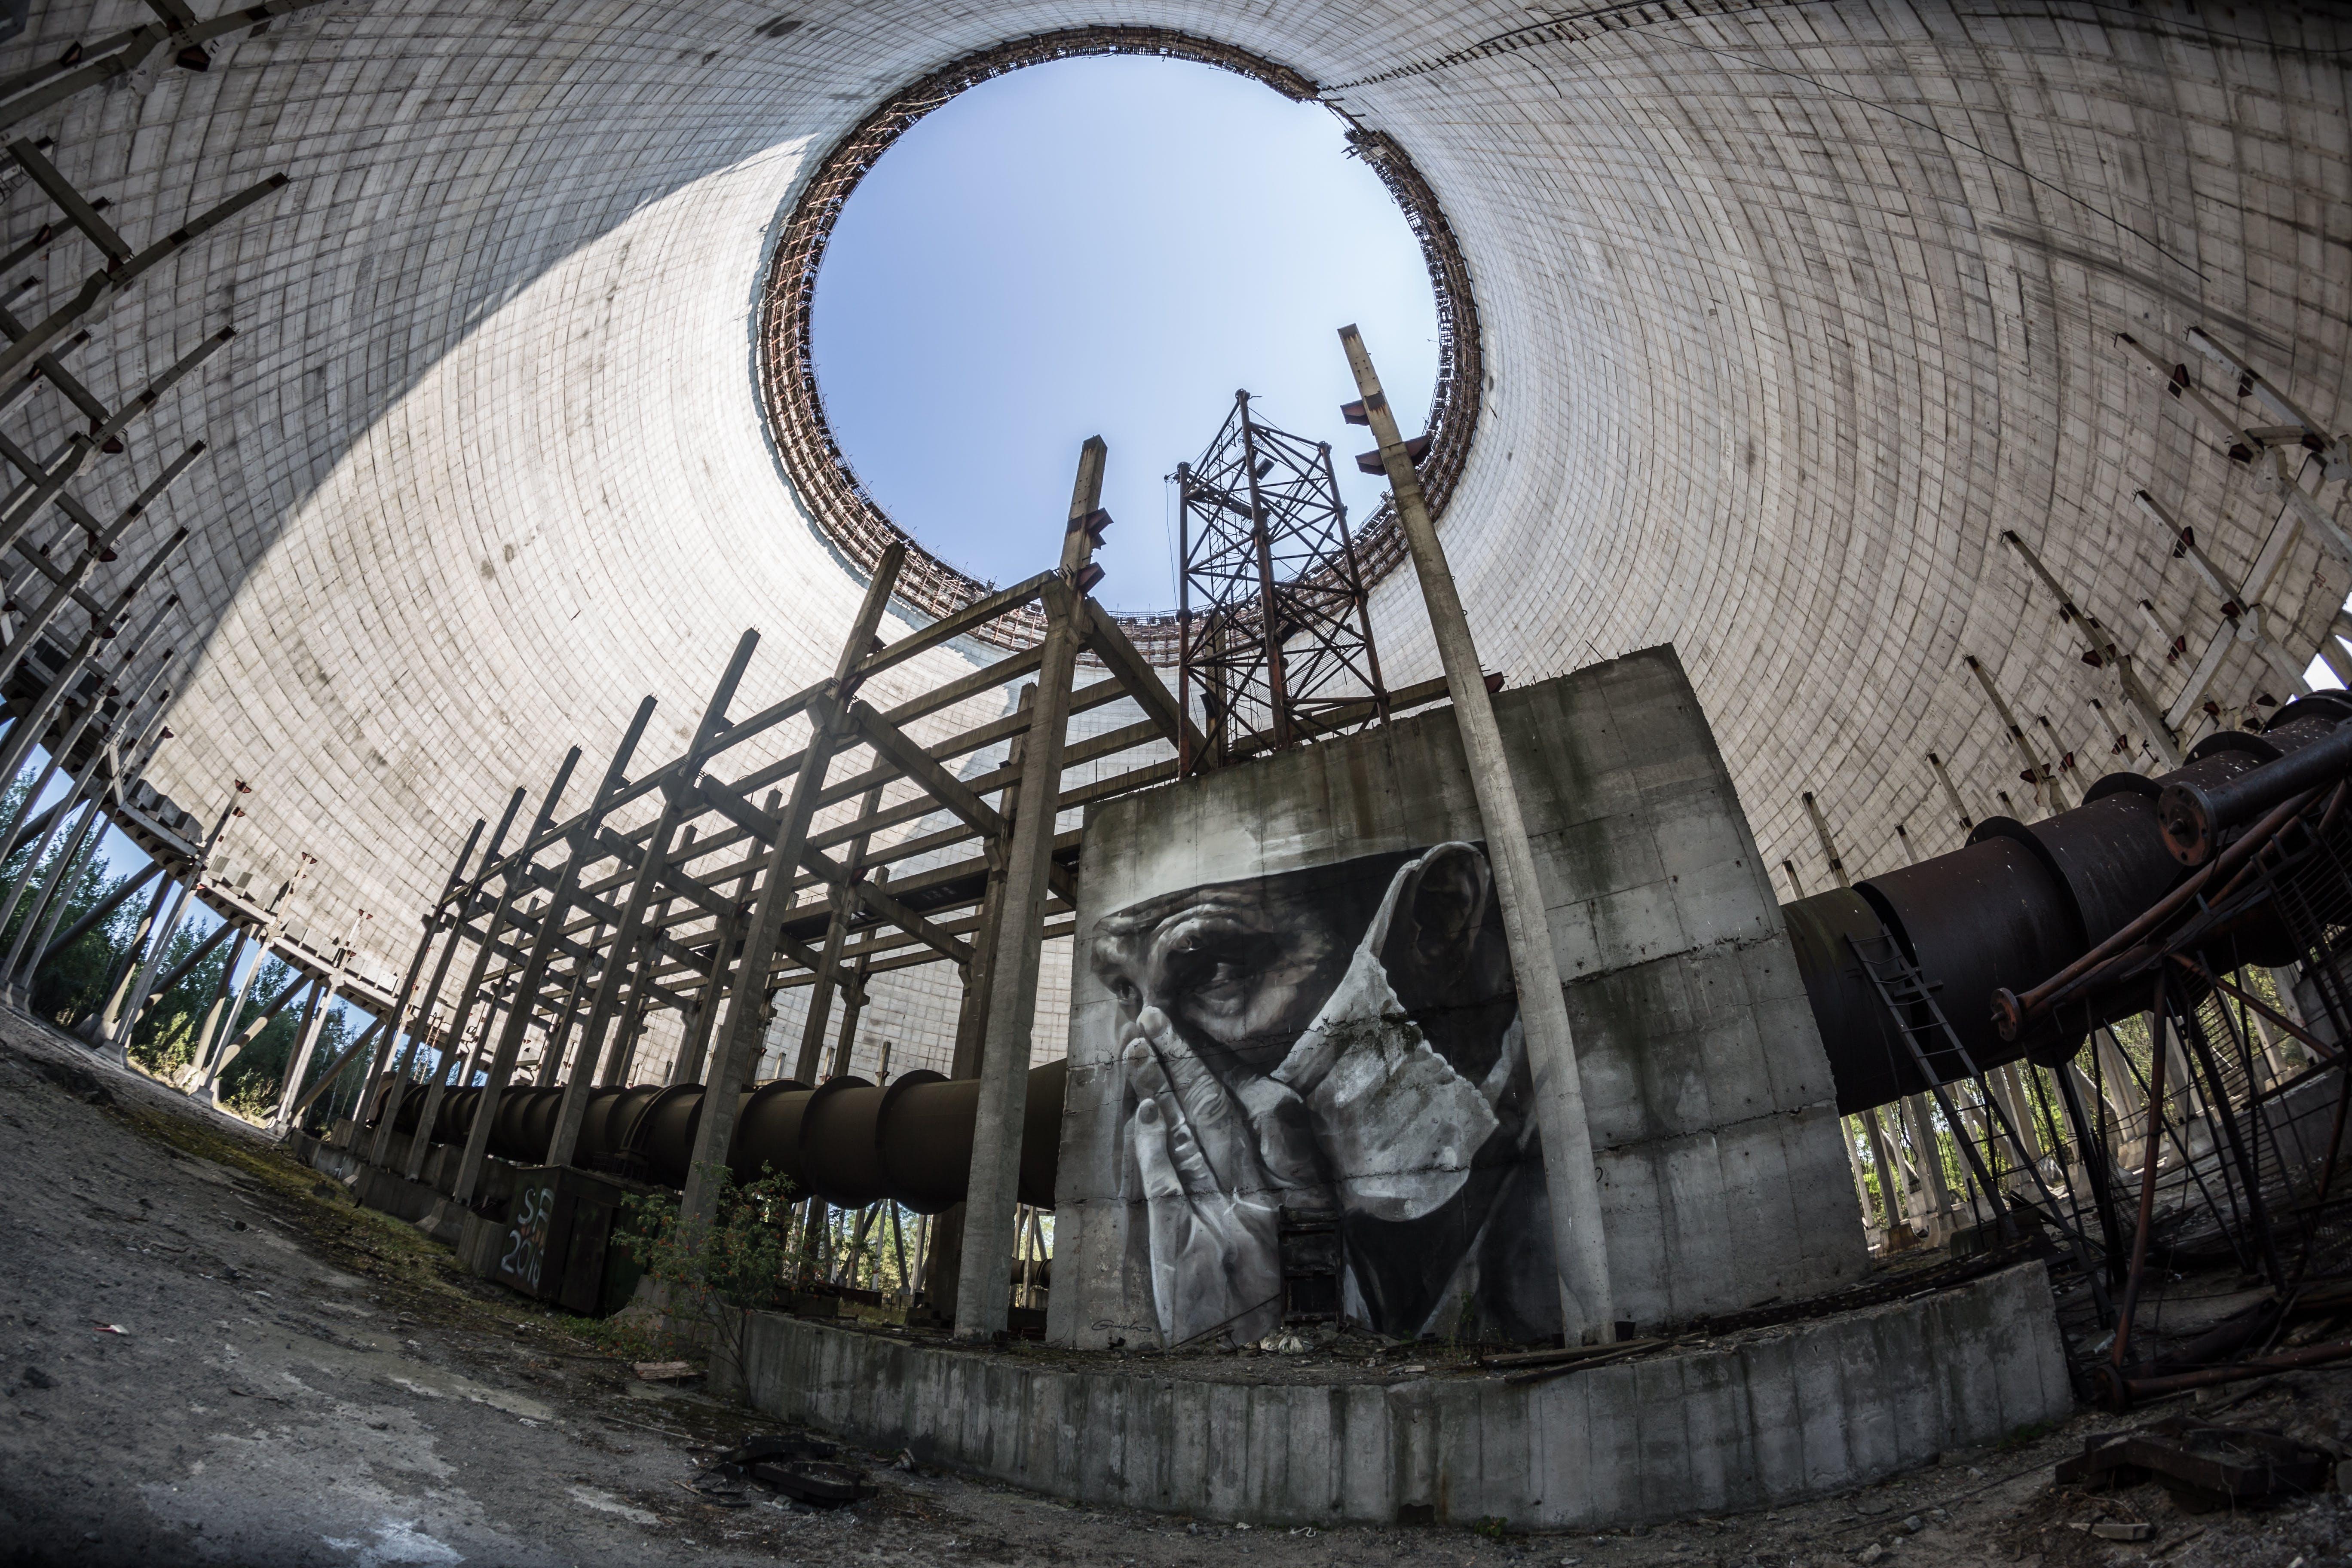 Man in Mask Graffiti on Wall